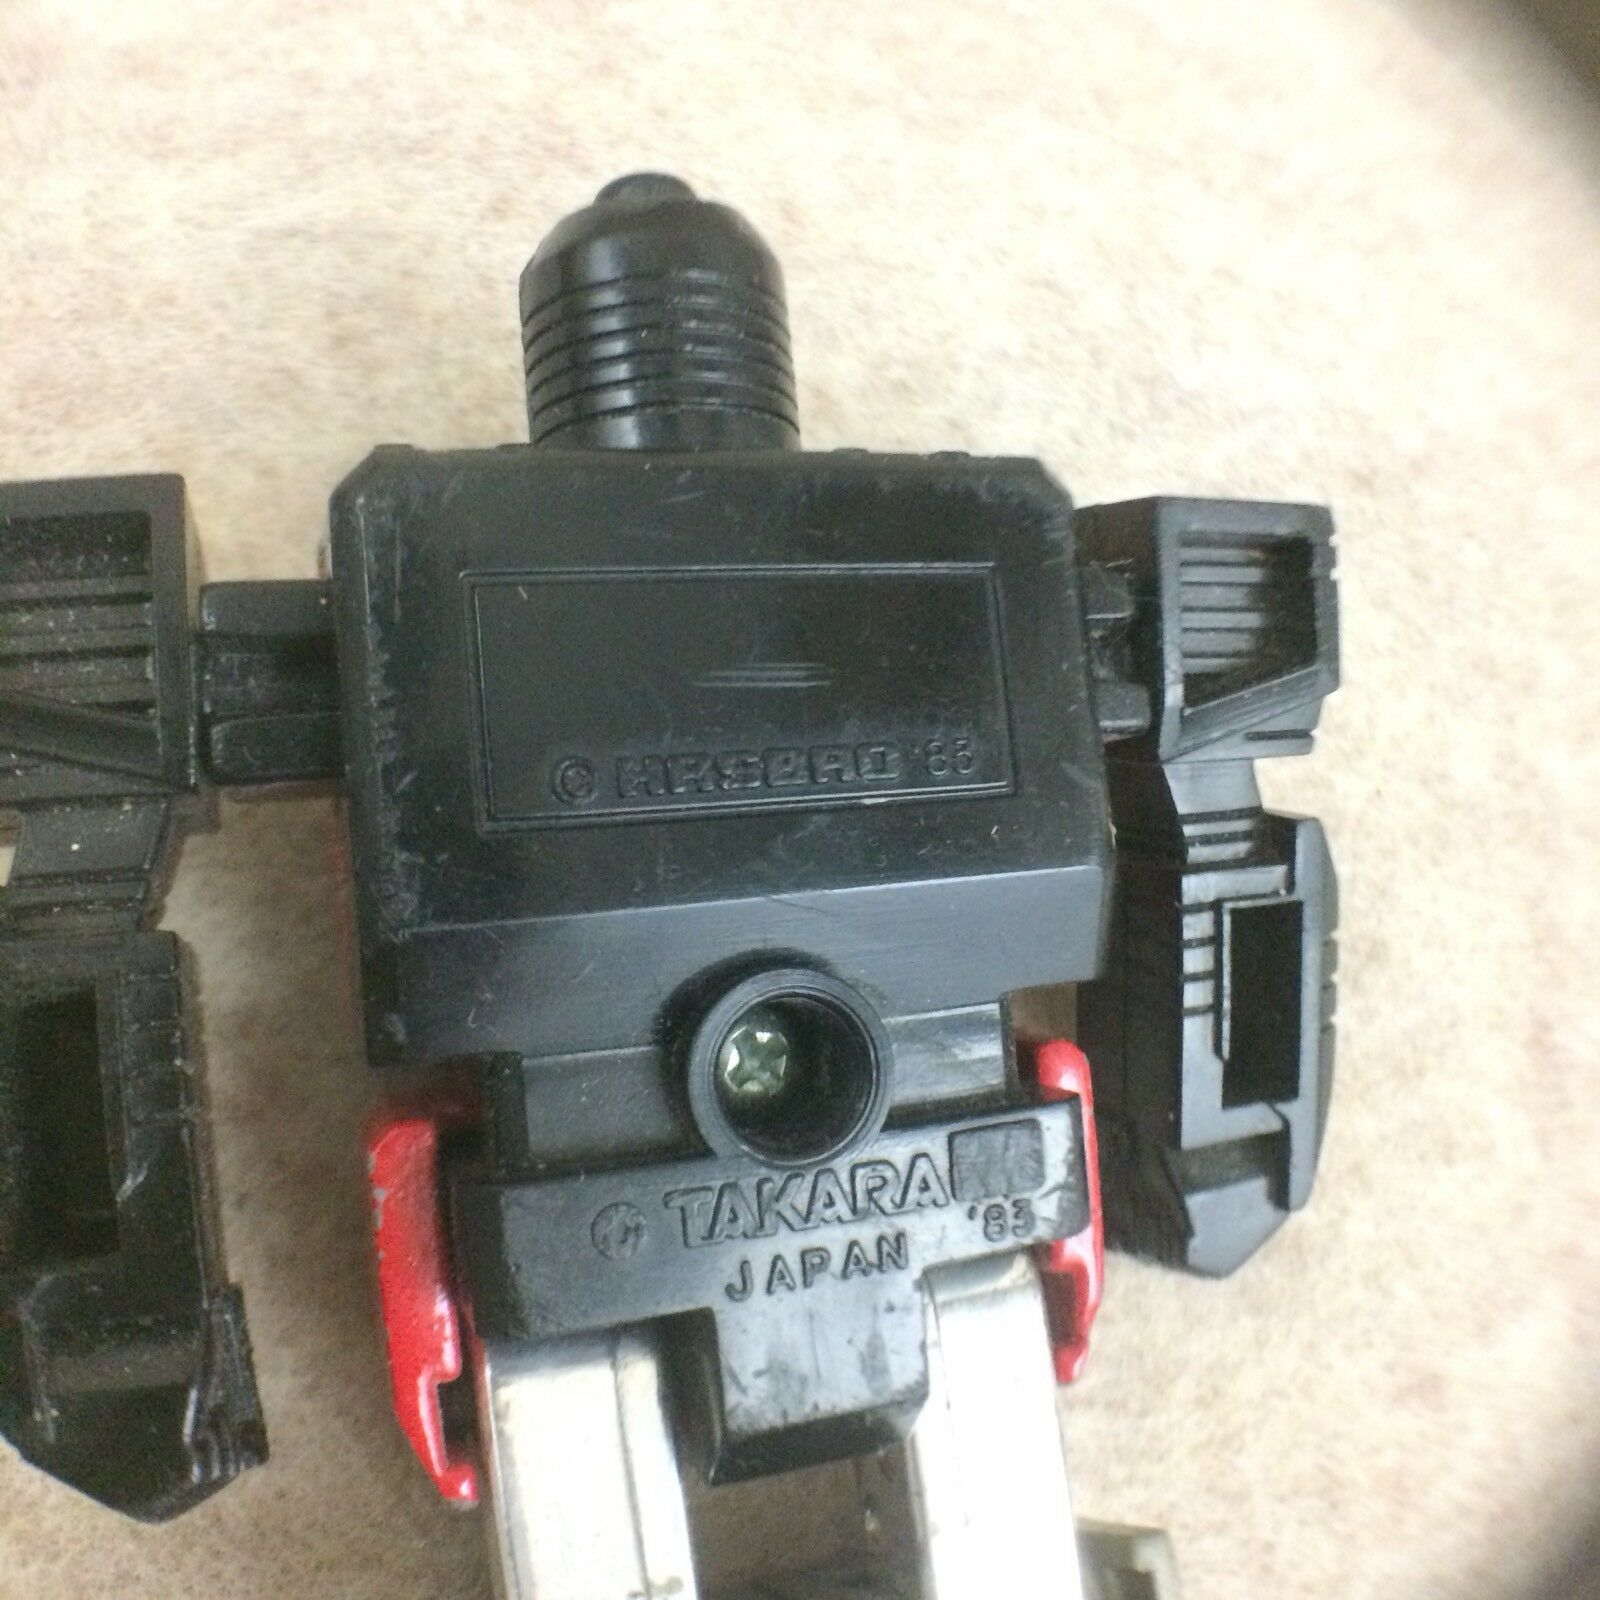 Spectro Reflector Reflector Reflector 1983 Vtg Hasbro G1 Transformers Camera Action Figure Takara 931d77